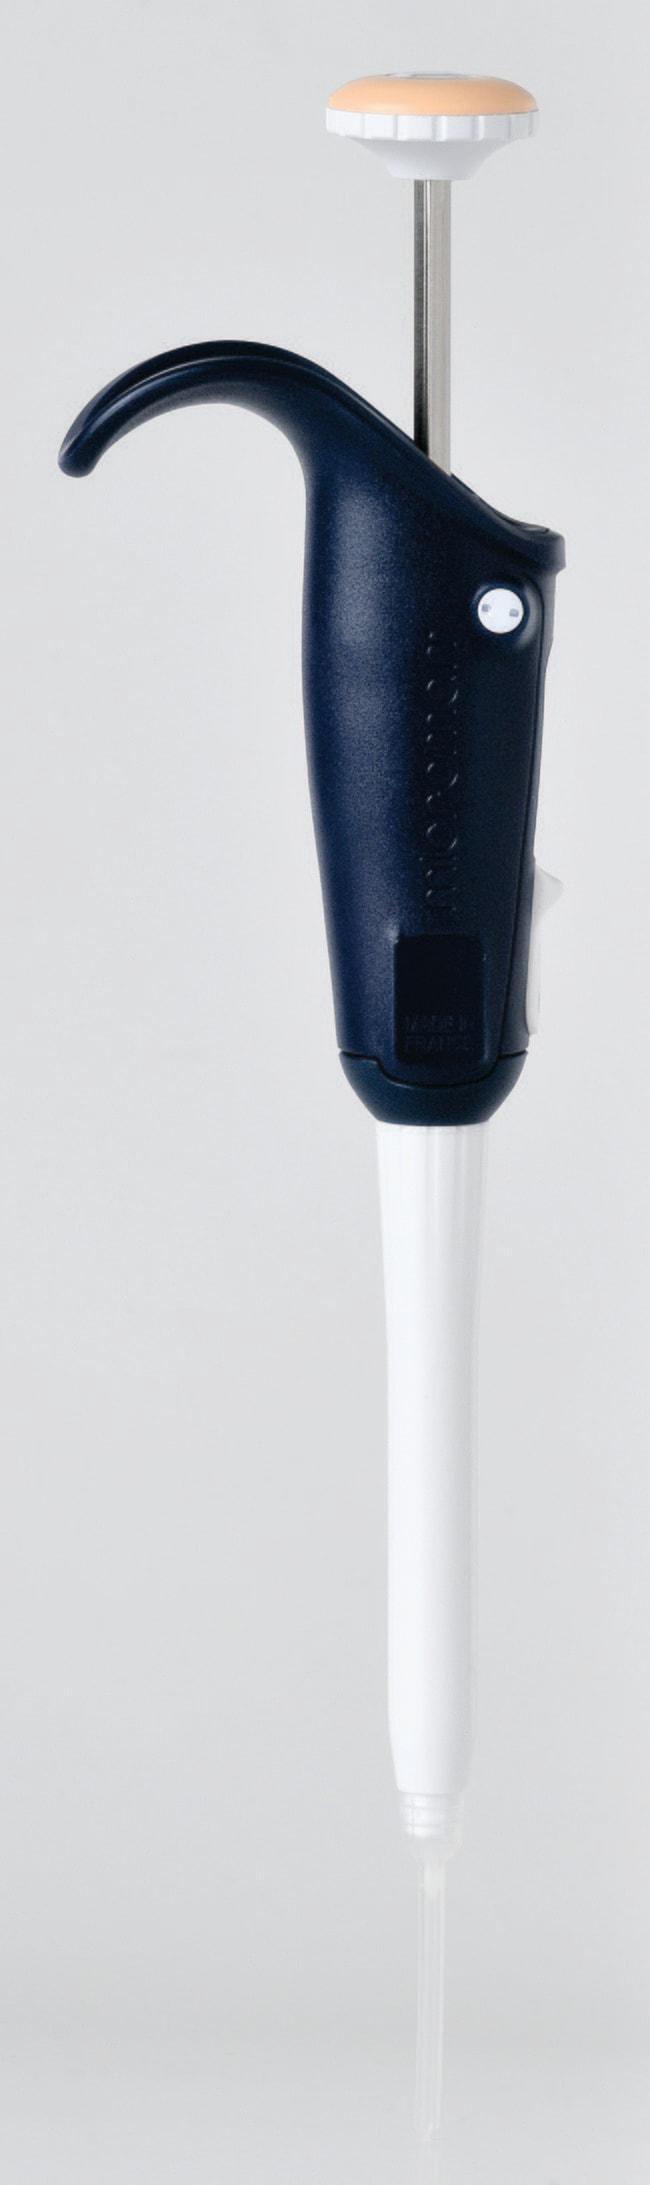 GilsonMICROMAN E Positive Displacement Pipettes Model: M100E; Vol.: 10